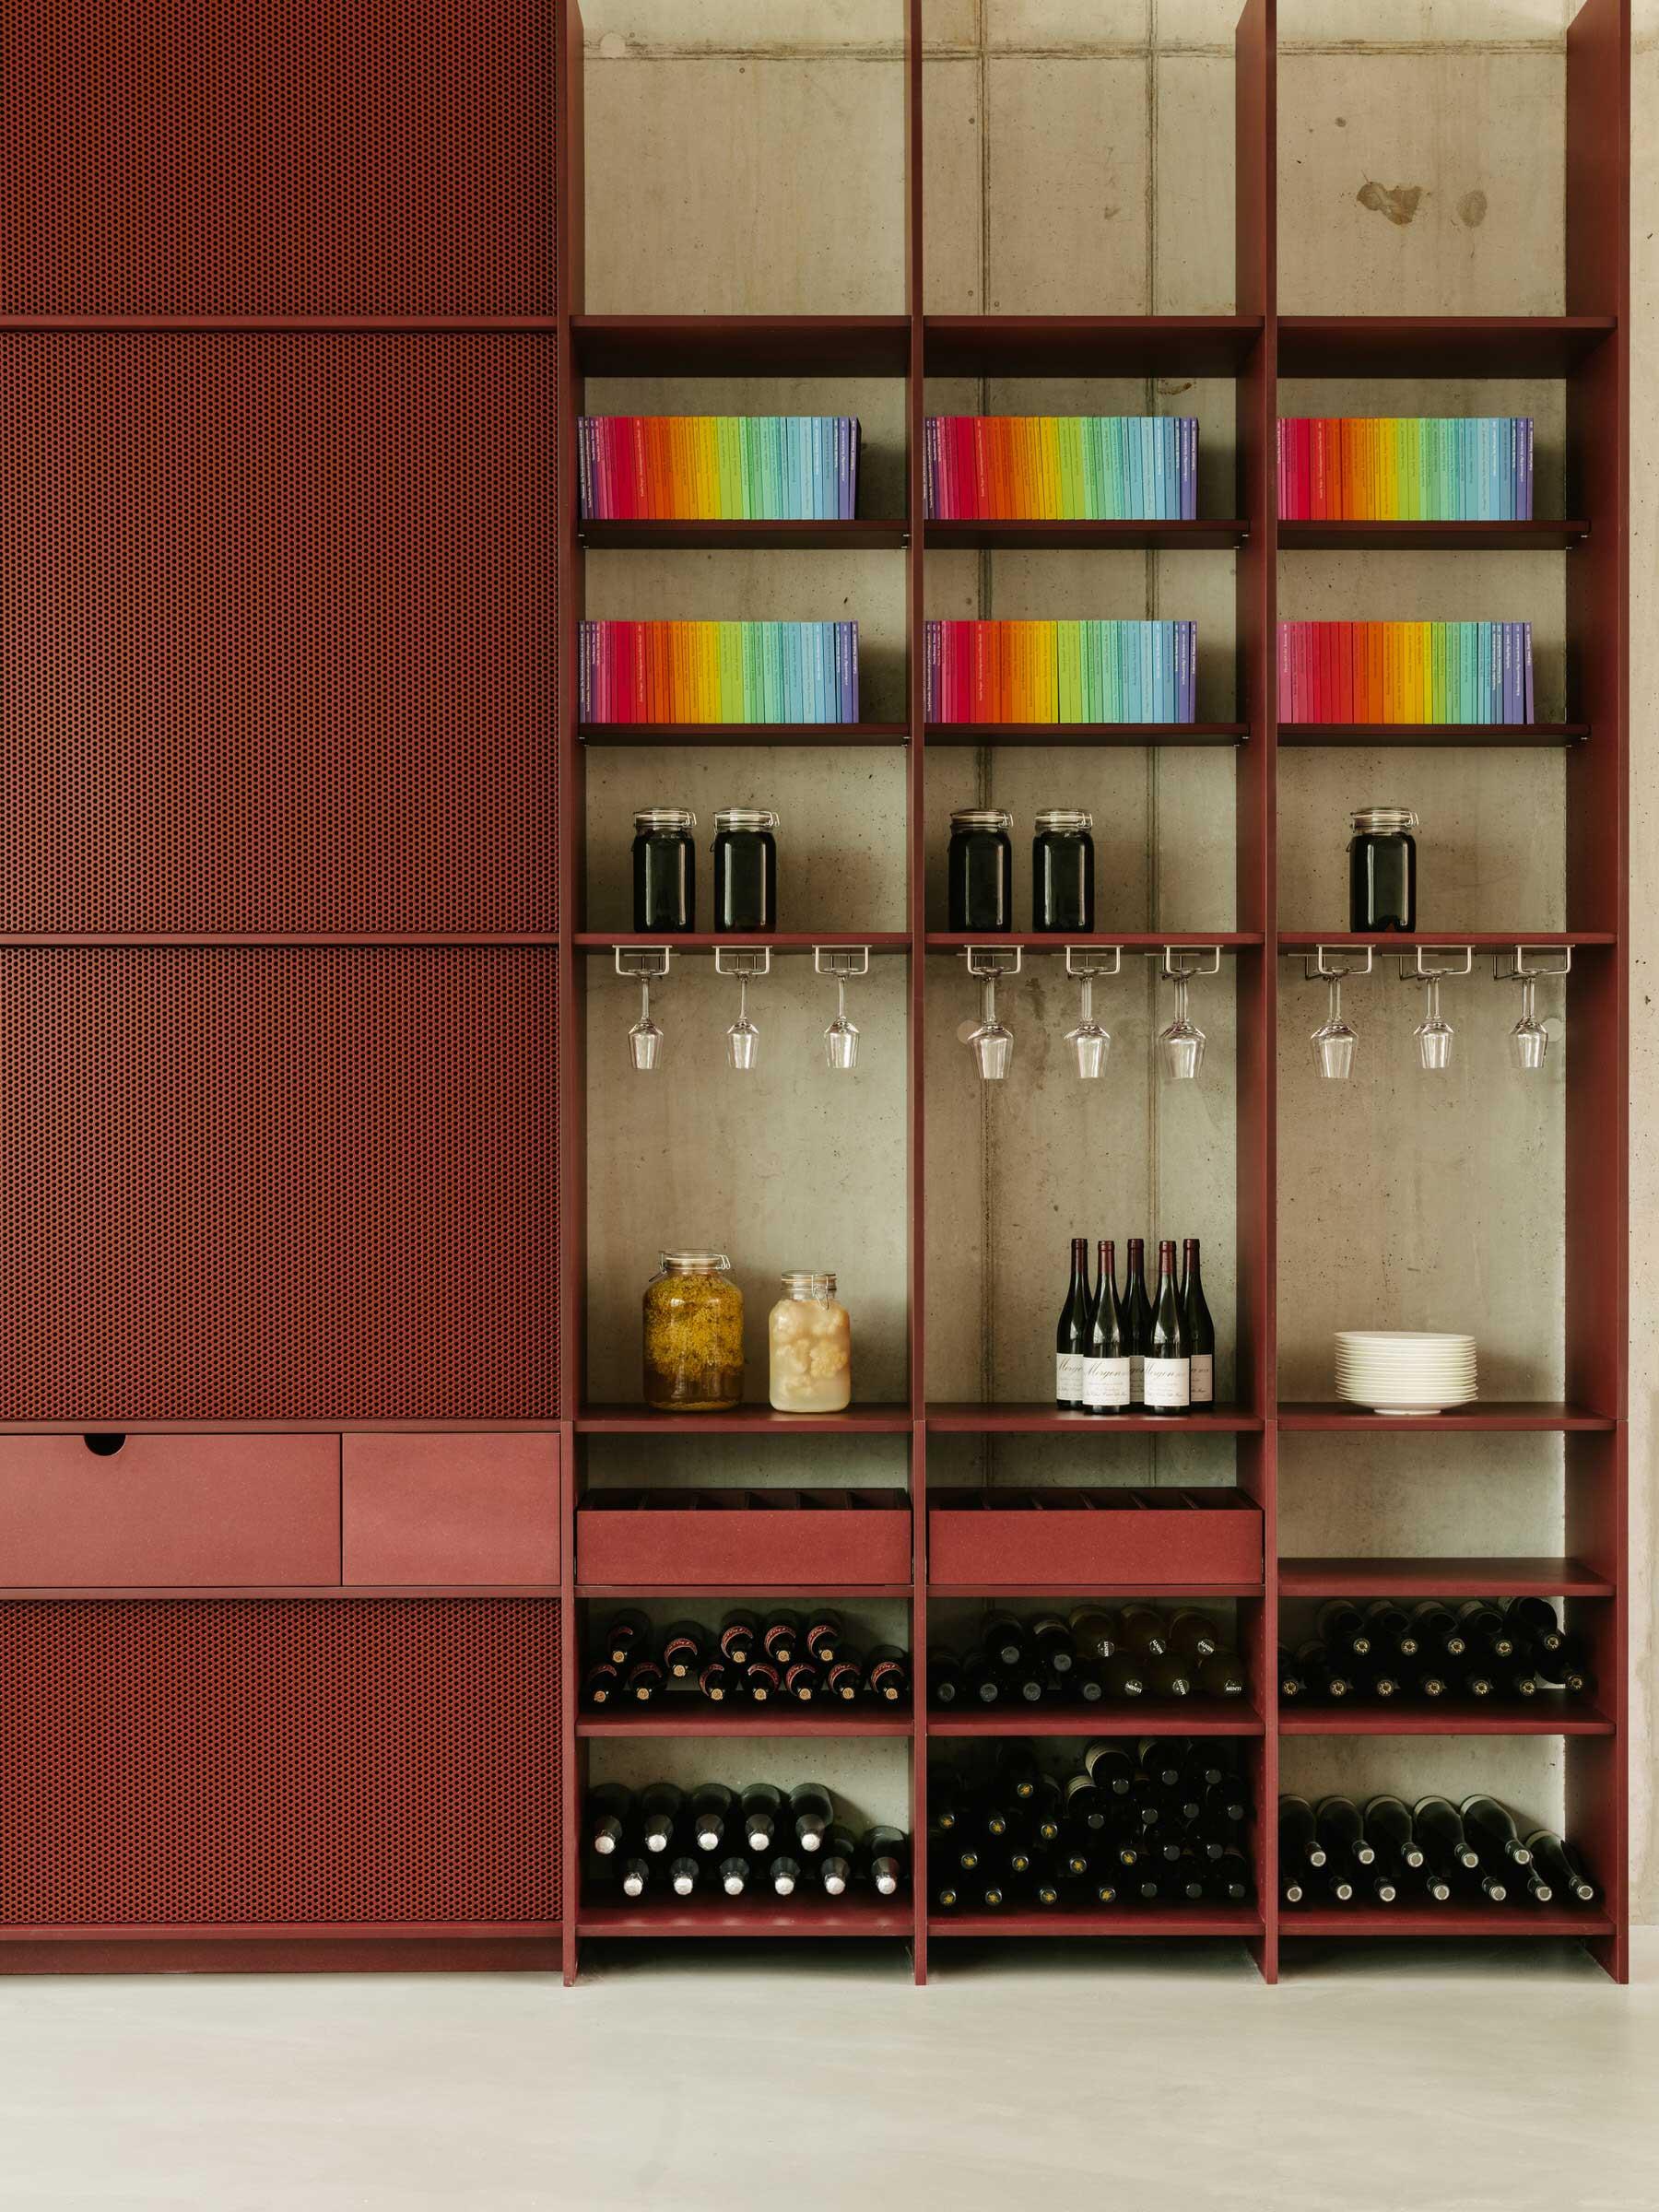 Ester Bruzkus Architekten, Restaurant Remi Berlin, Hospitality Design, Photo Robert Rieger | Yellowtrace